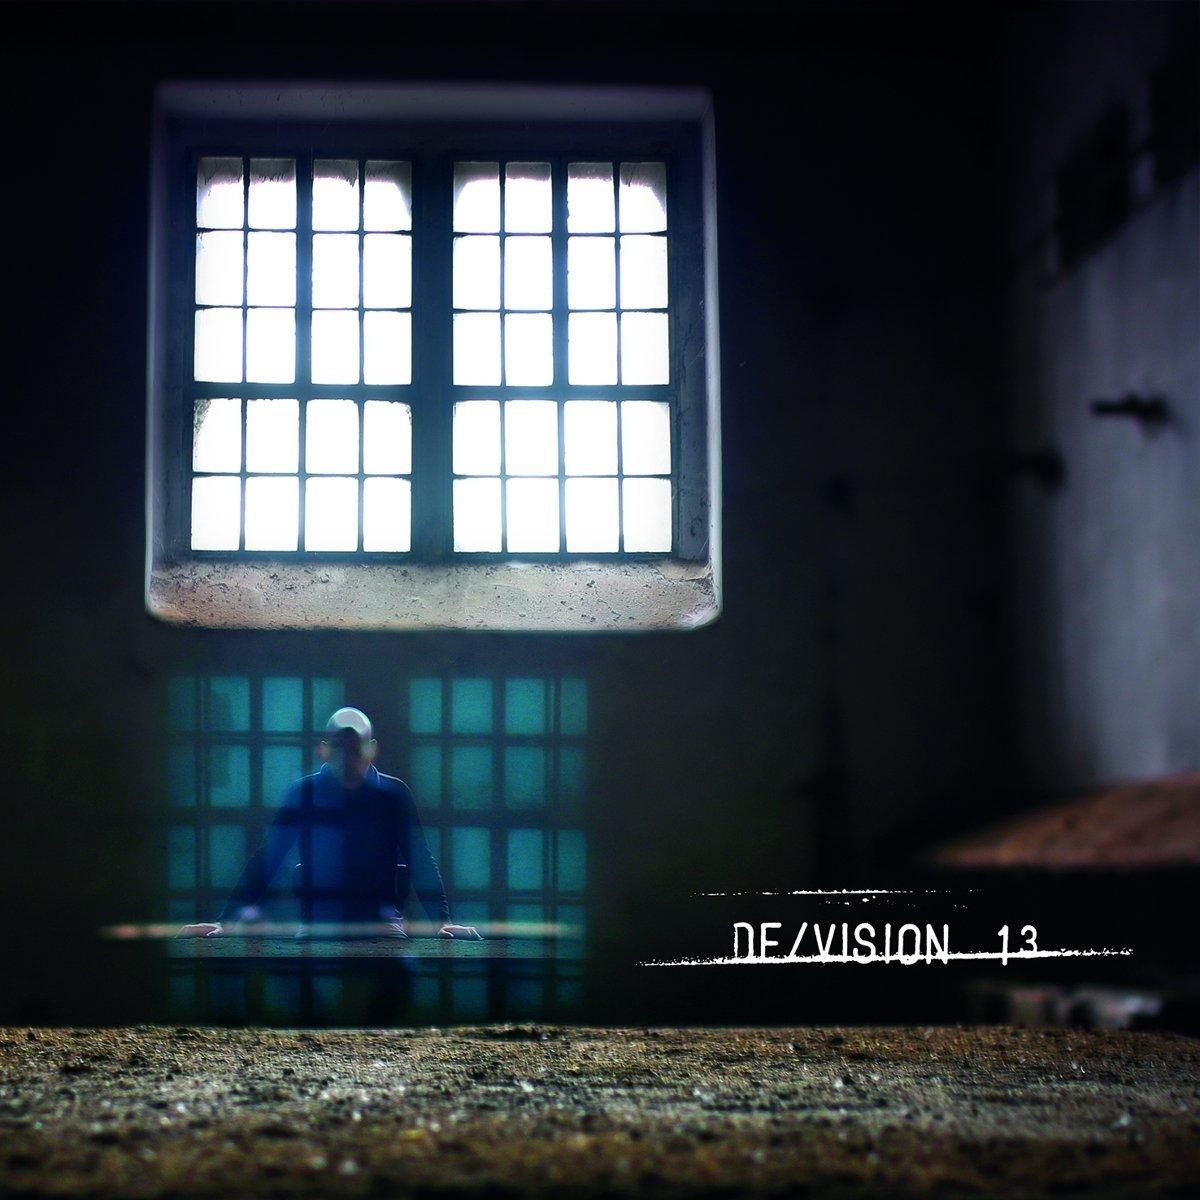 devision_13